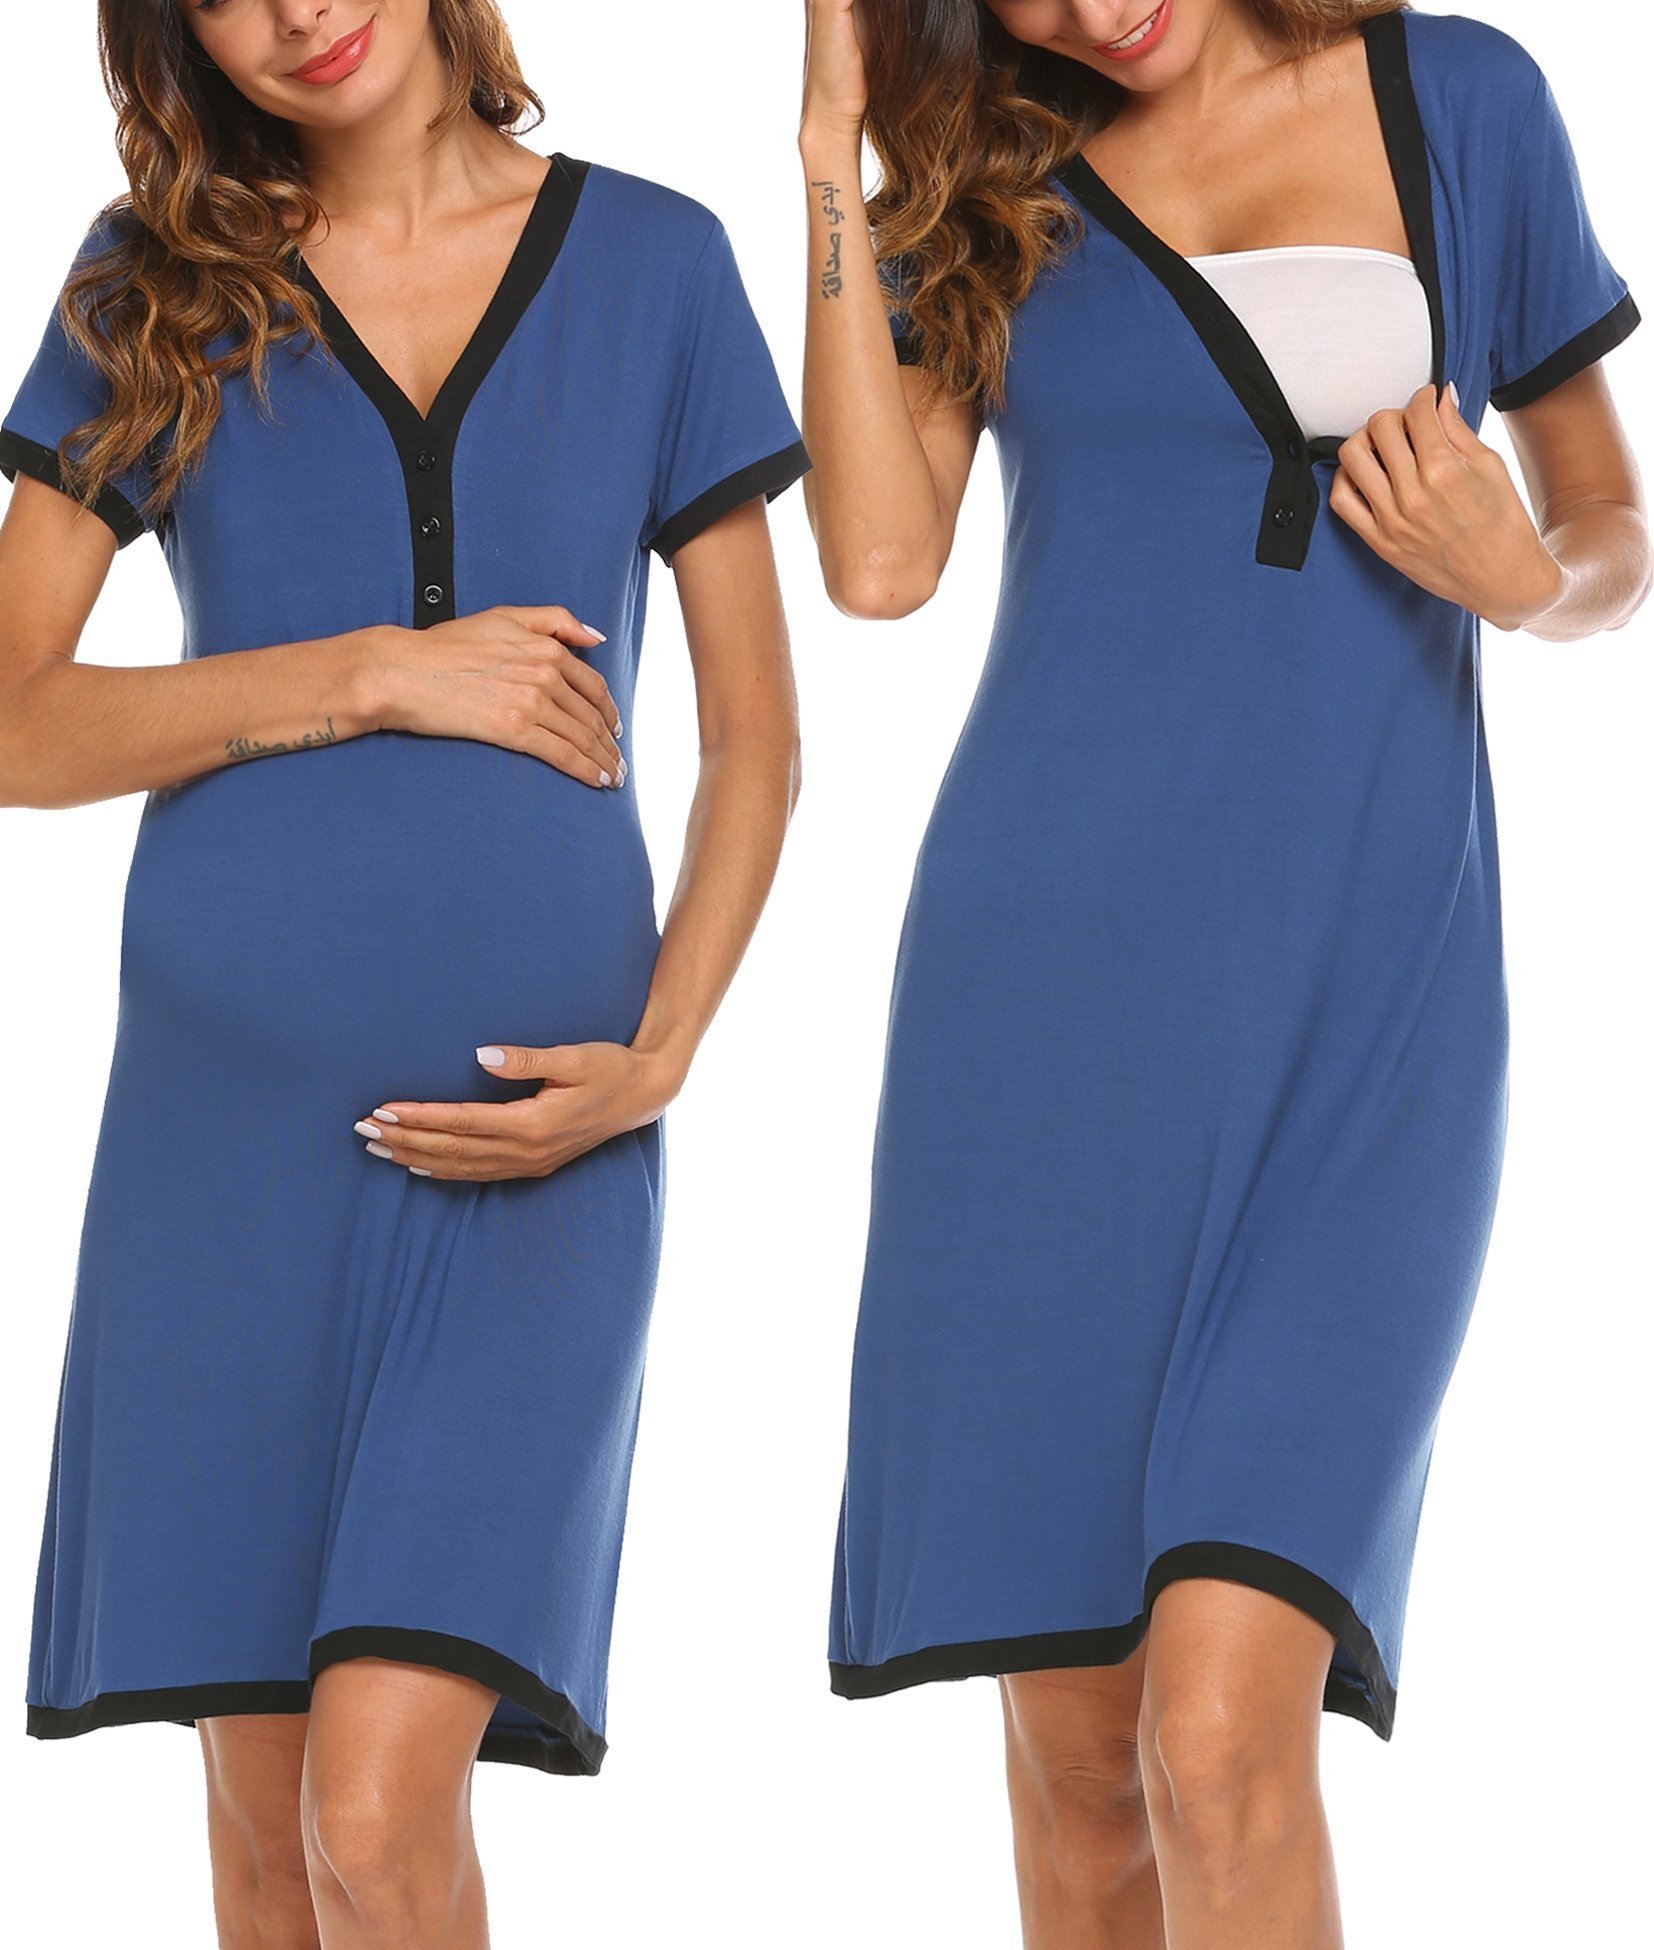 Ekouaer Women's Maternity V-Neck Short Sleeve Patchwork Nursing Breastfeeding Sleepshirts